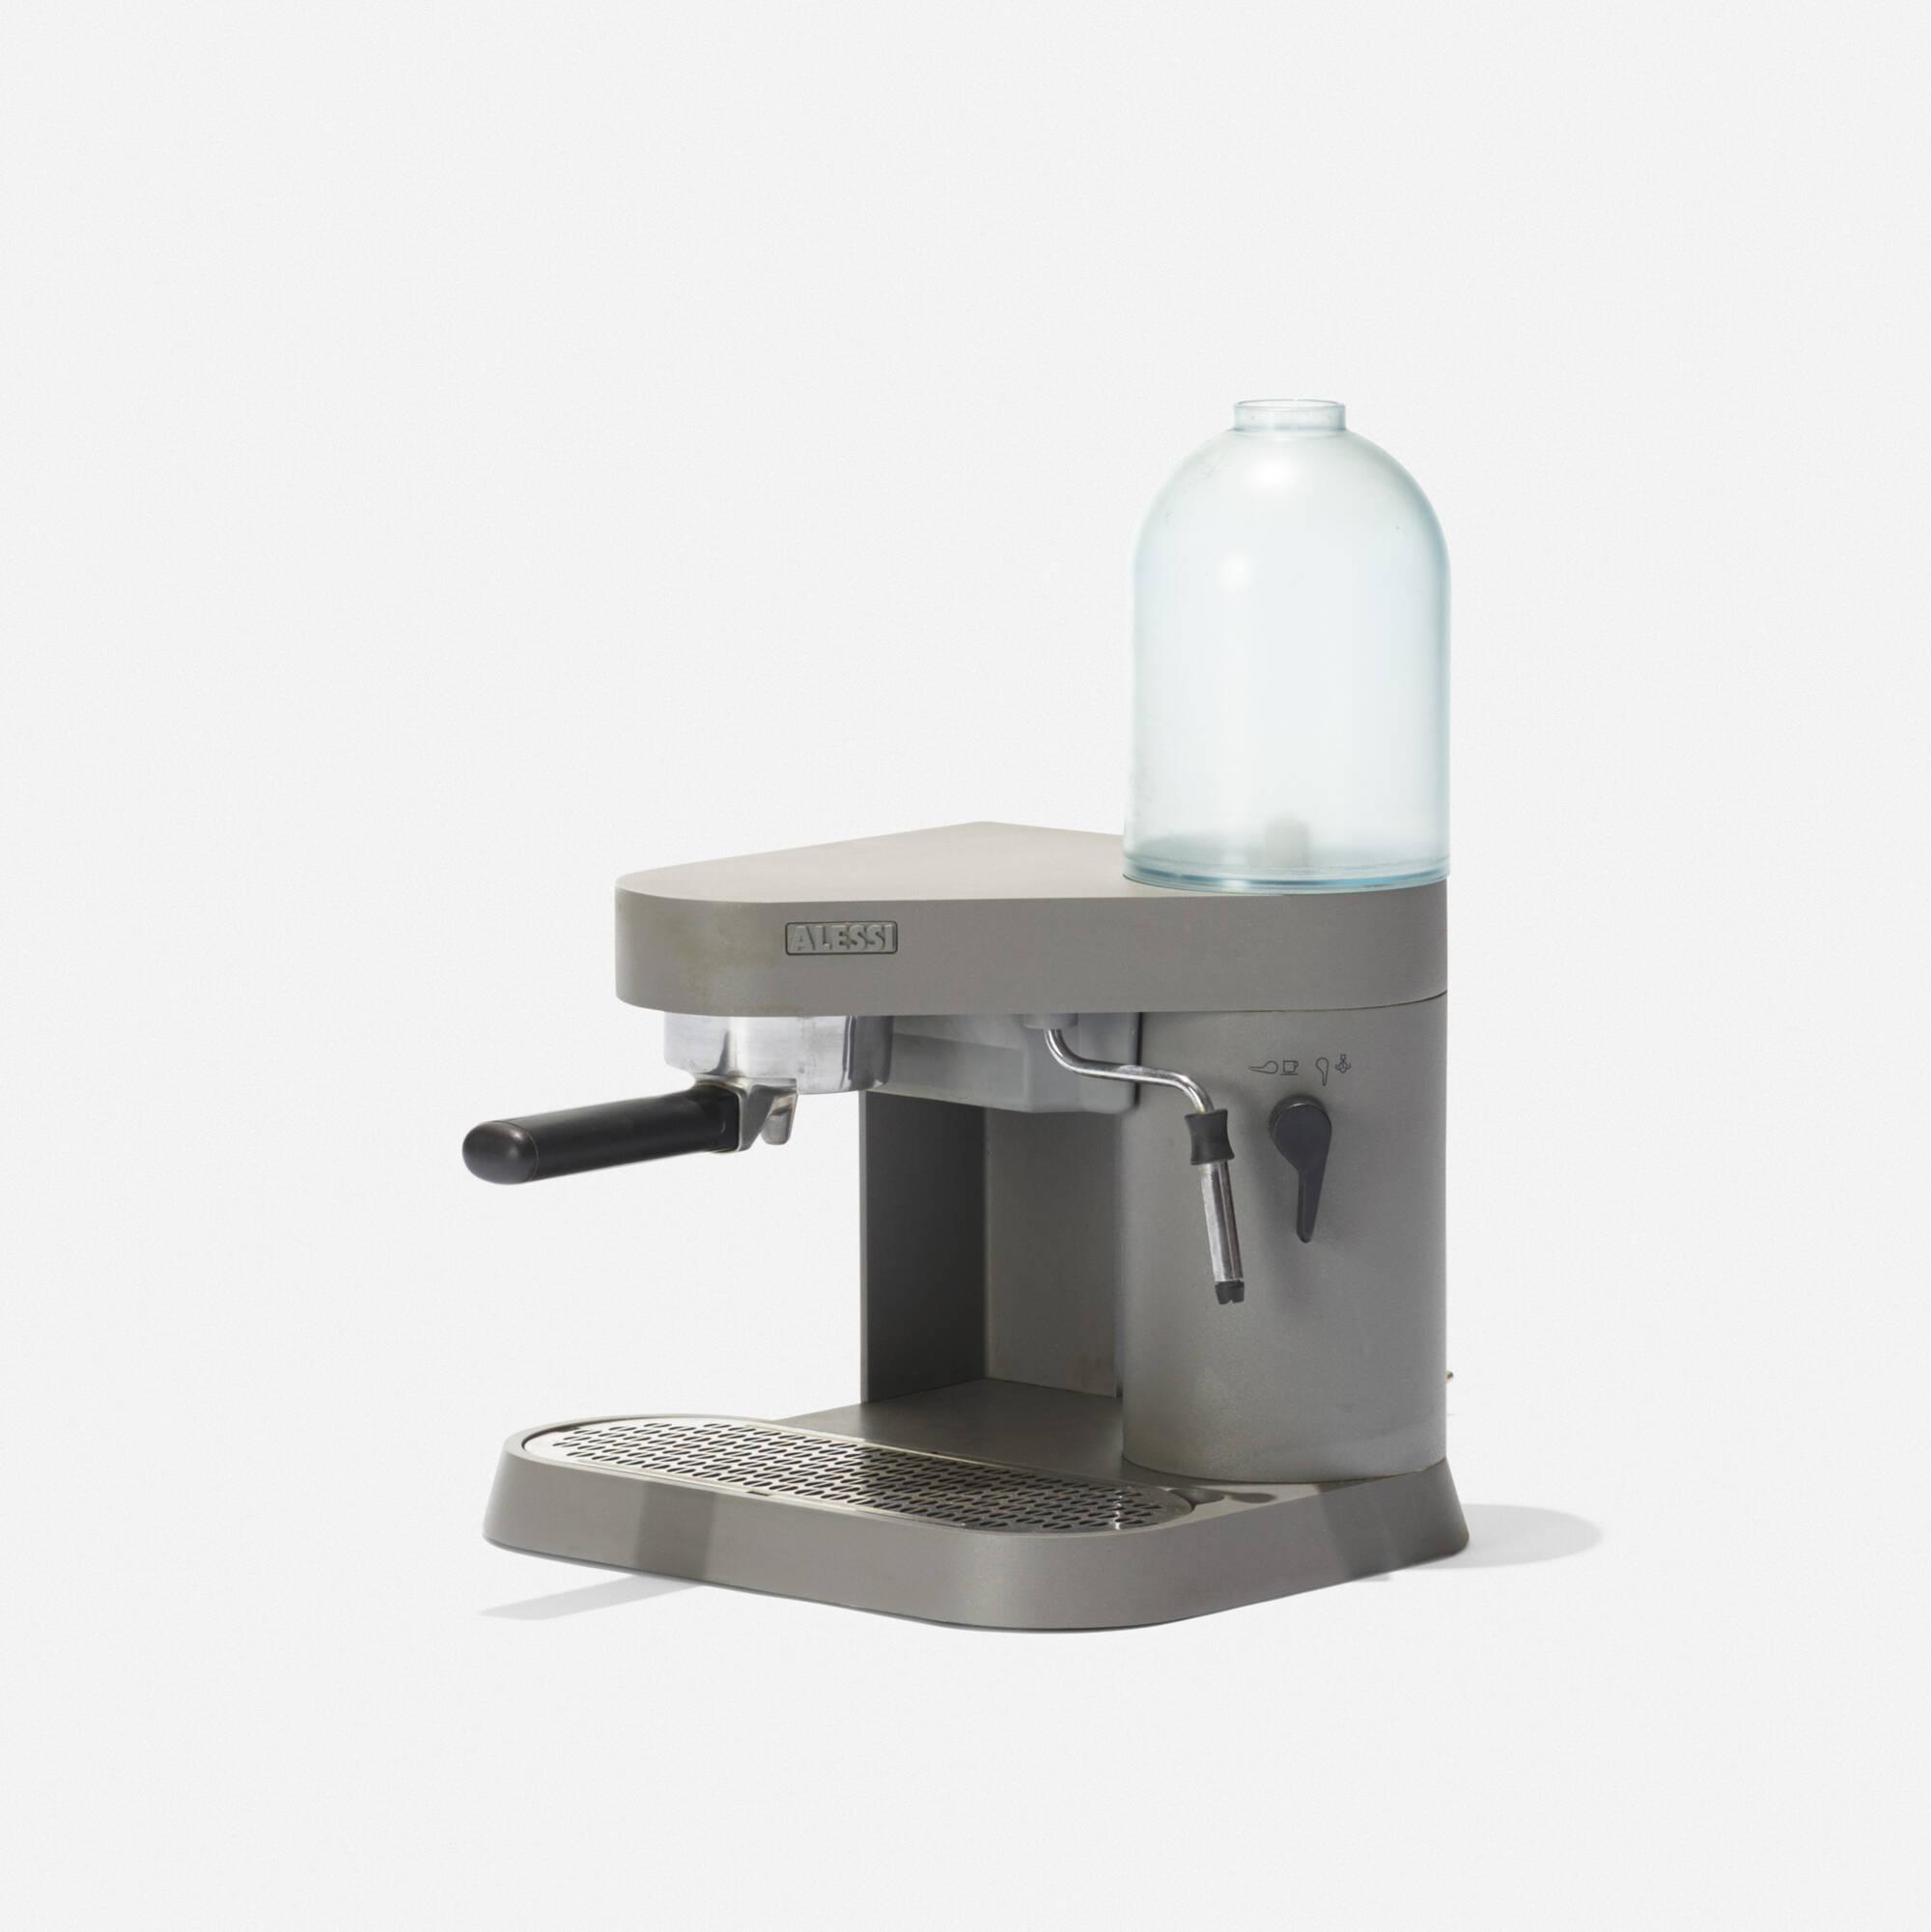 436: Richard Sapper / Coban Espresso machine (1 of 1)